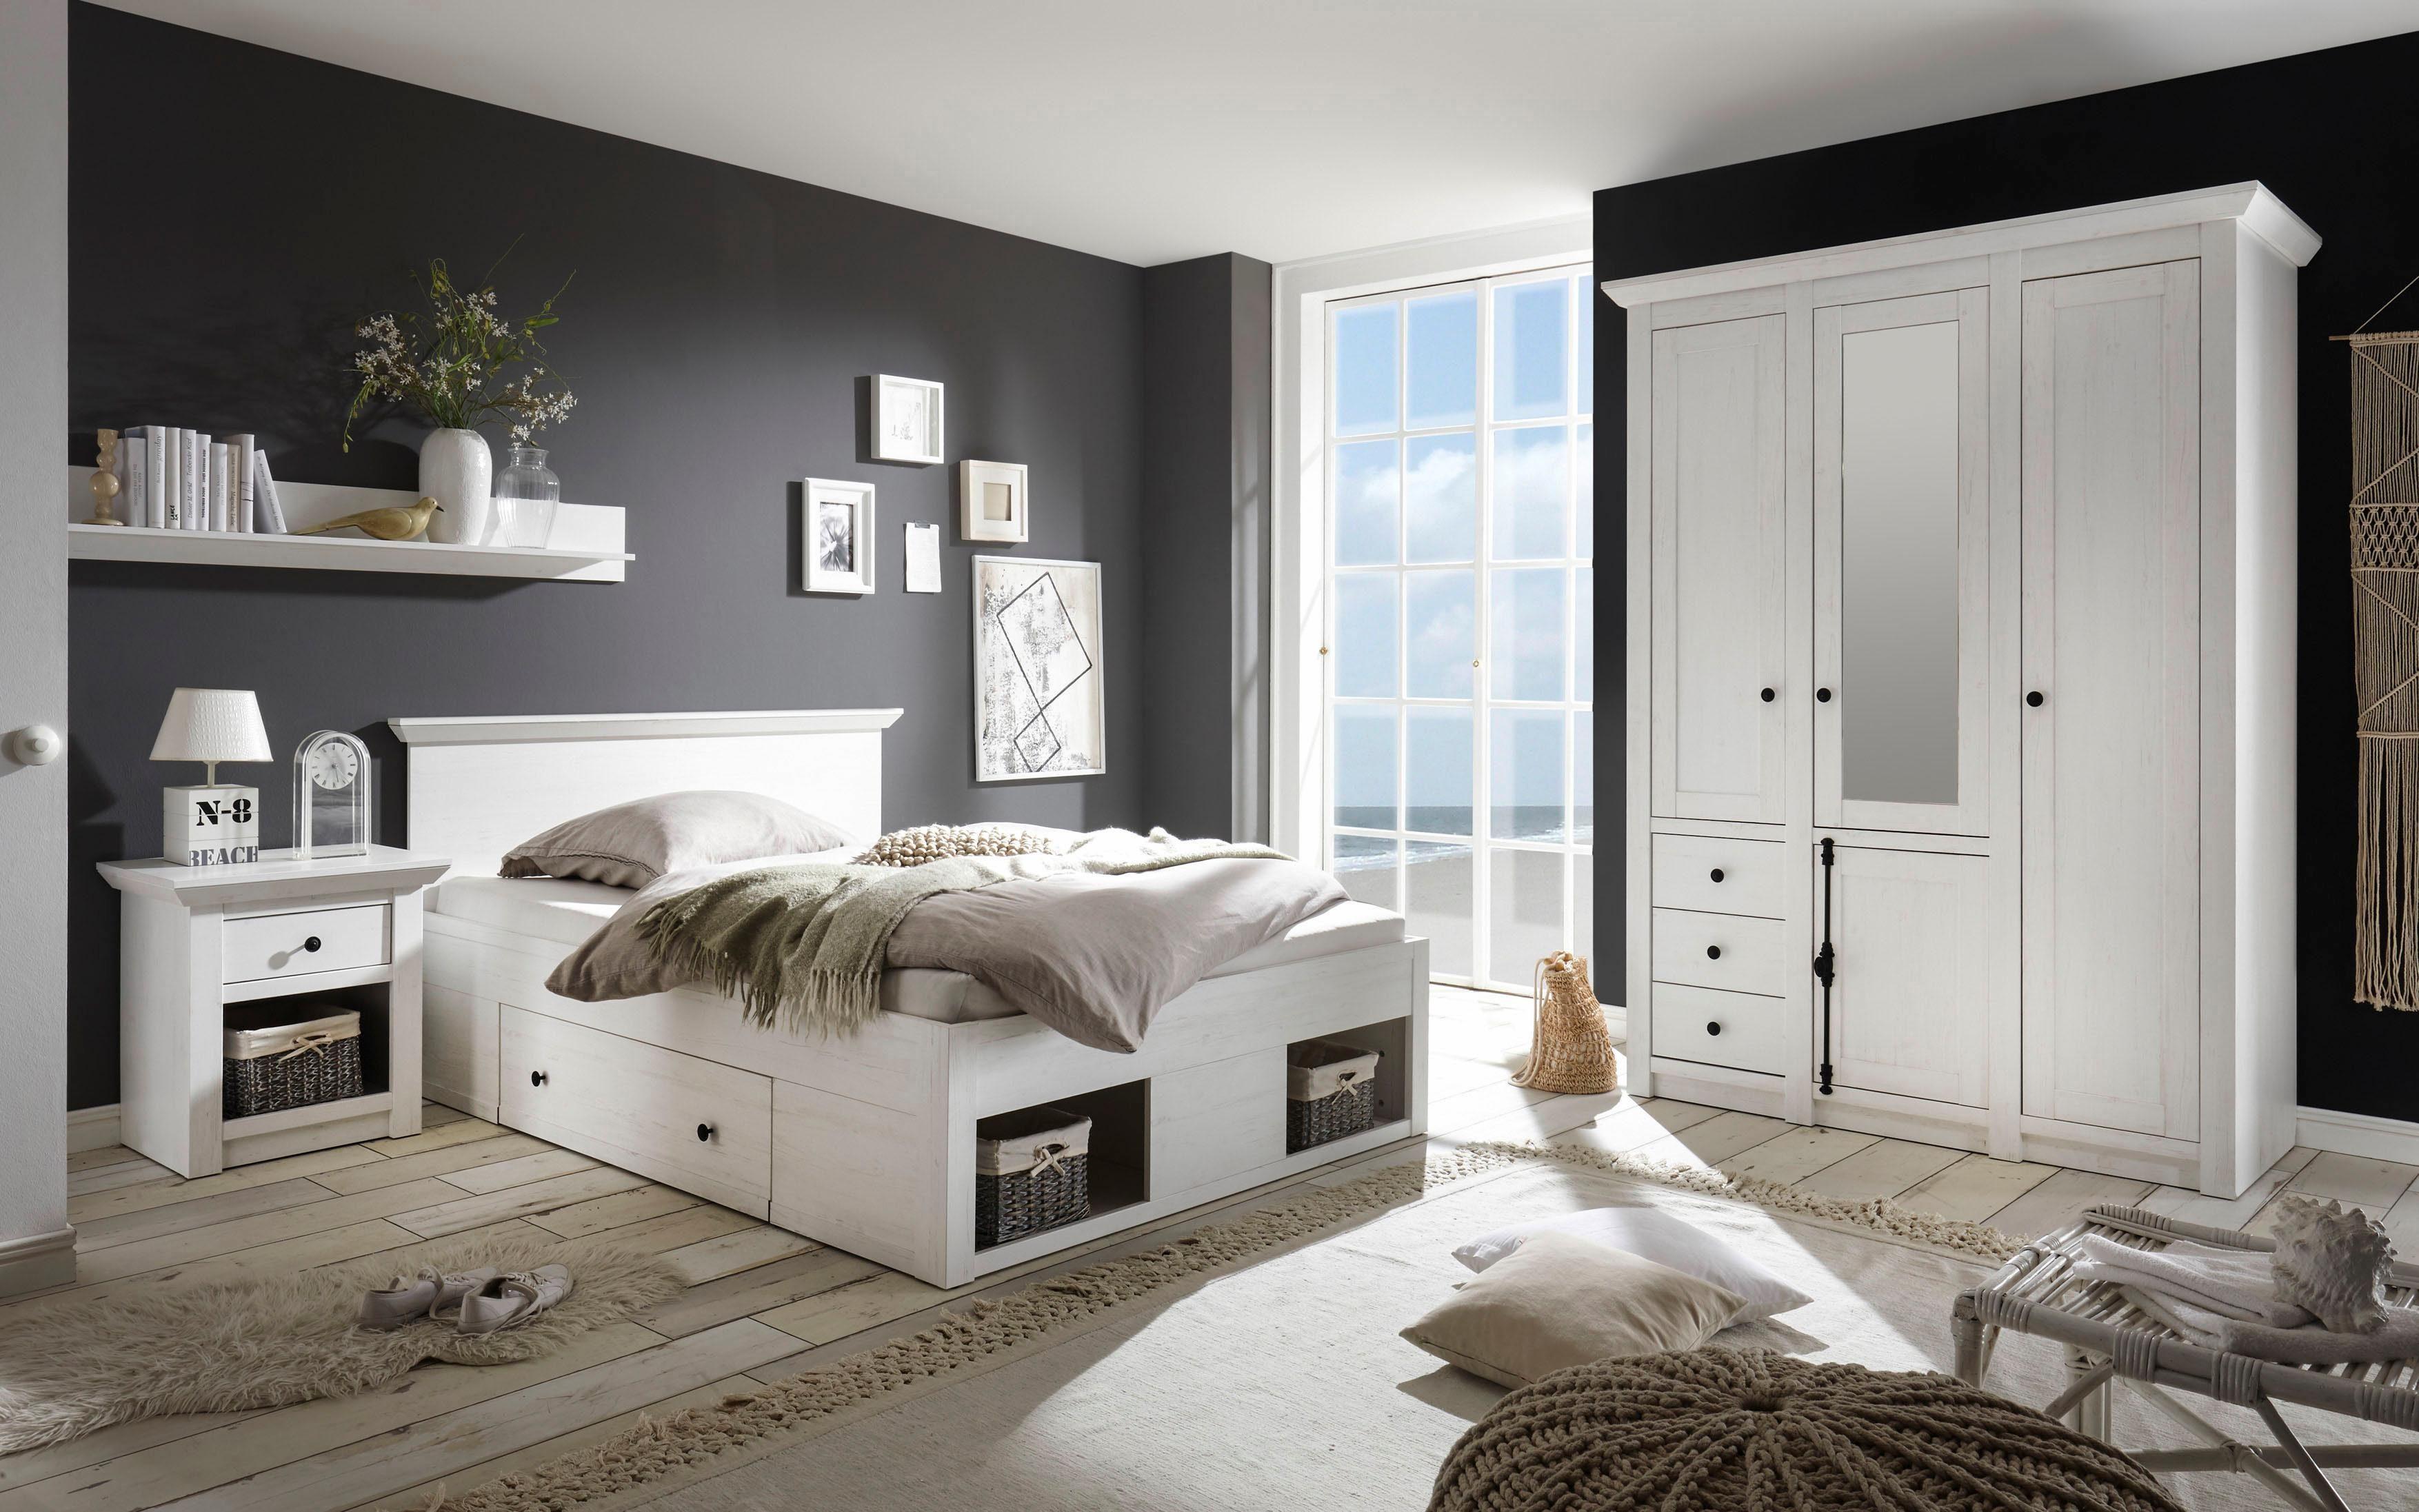 Schlafzimmer Komplett 140 Cm Bett  Home Affaire Schlafzimmer Set 187;california171; Klein Bett